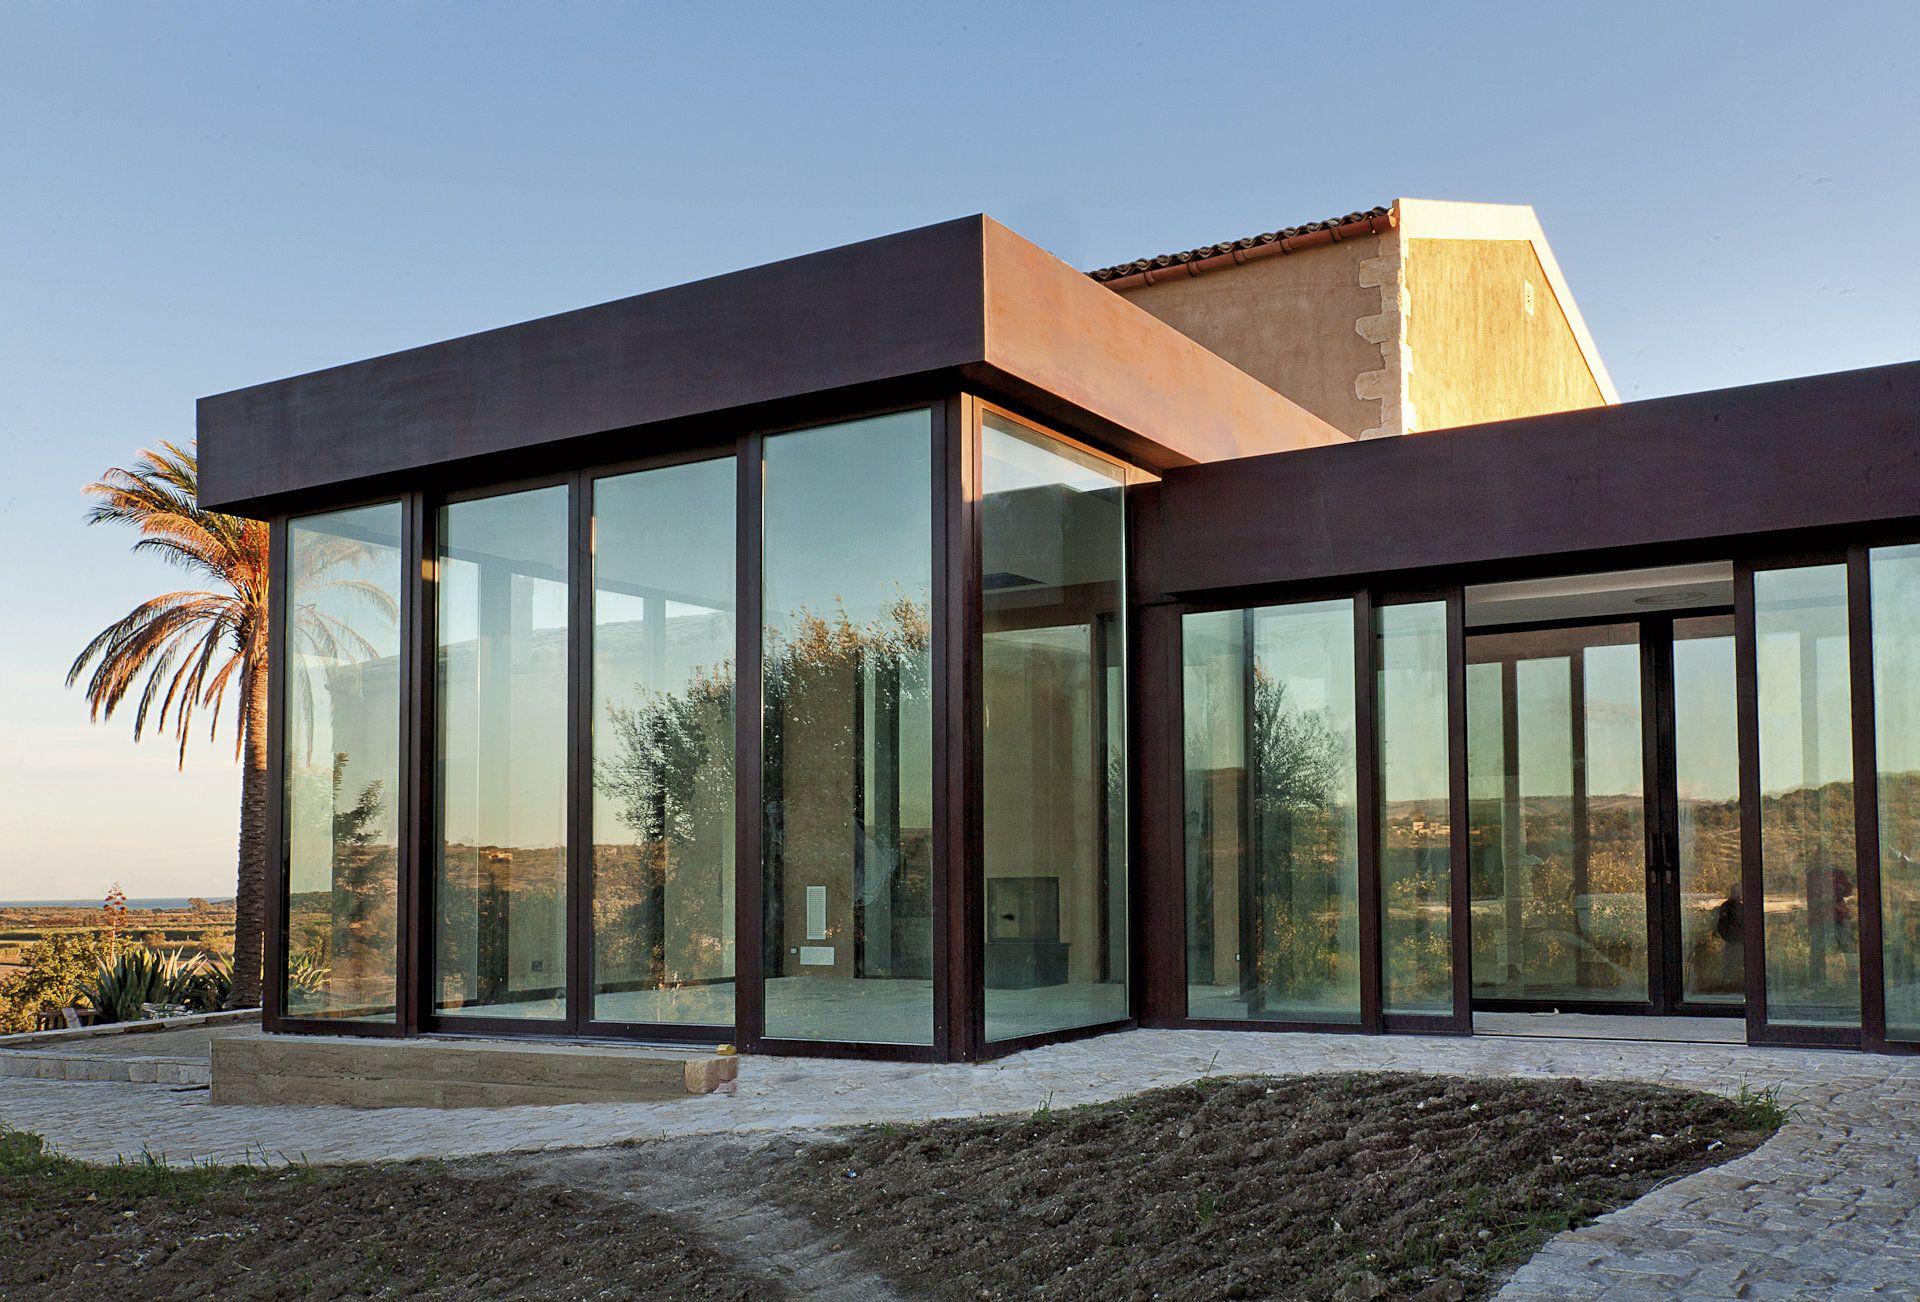 Giardino duinverno in acciaio corten with giardini d for Galimberti case legno